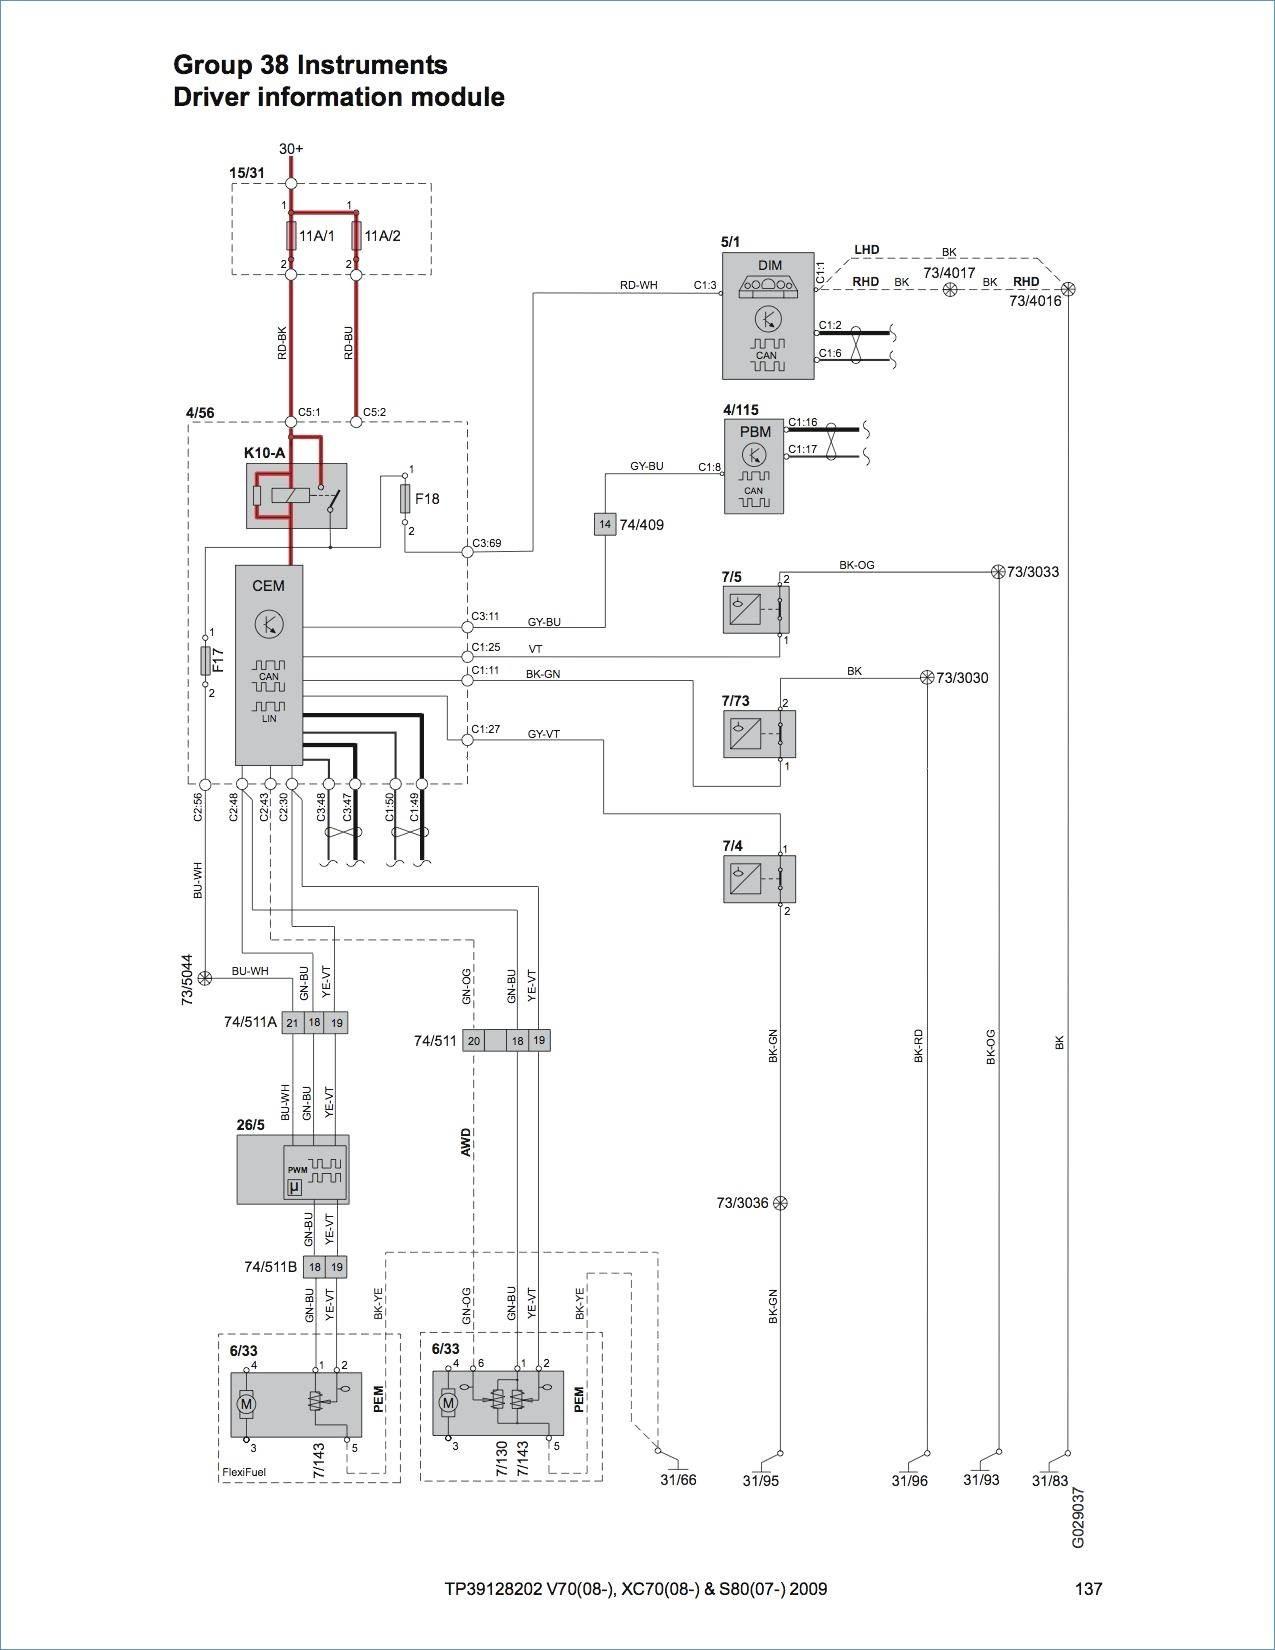 2004 Volvo S40 Engine Diagram Volvo Xc90 Wiring Diagram Data Schematics Wiring Diagram • Of 2004 Volvo S40 Engine Diagram